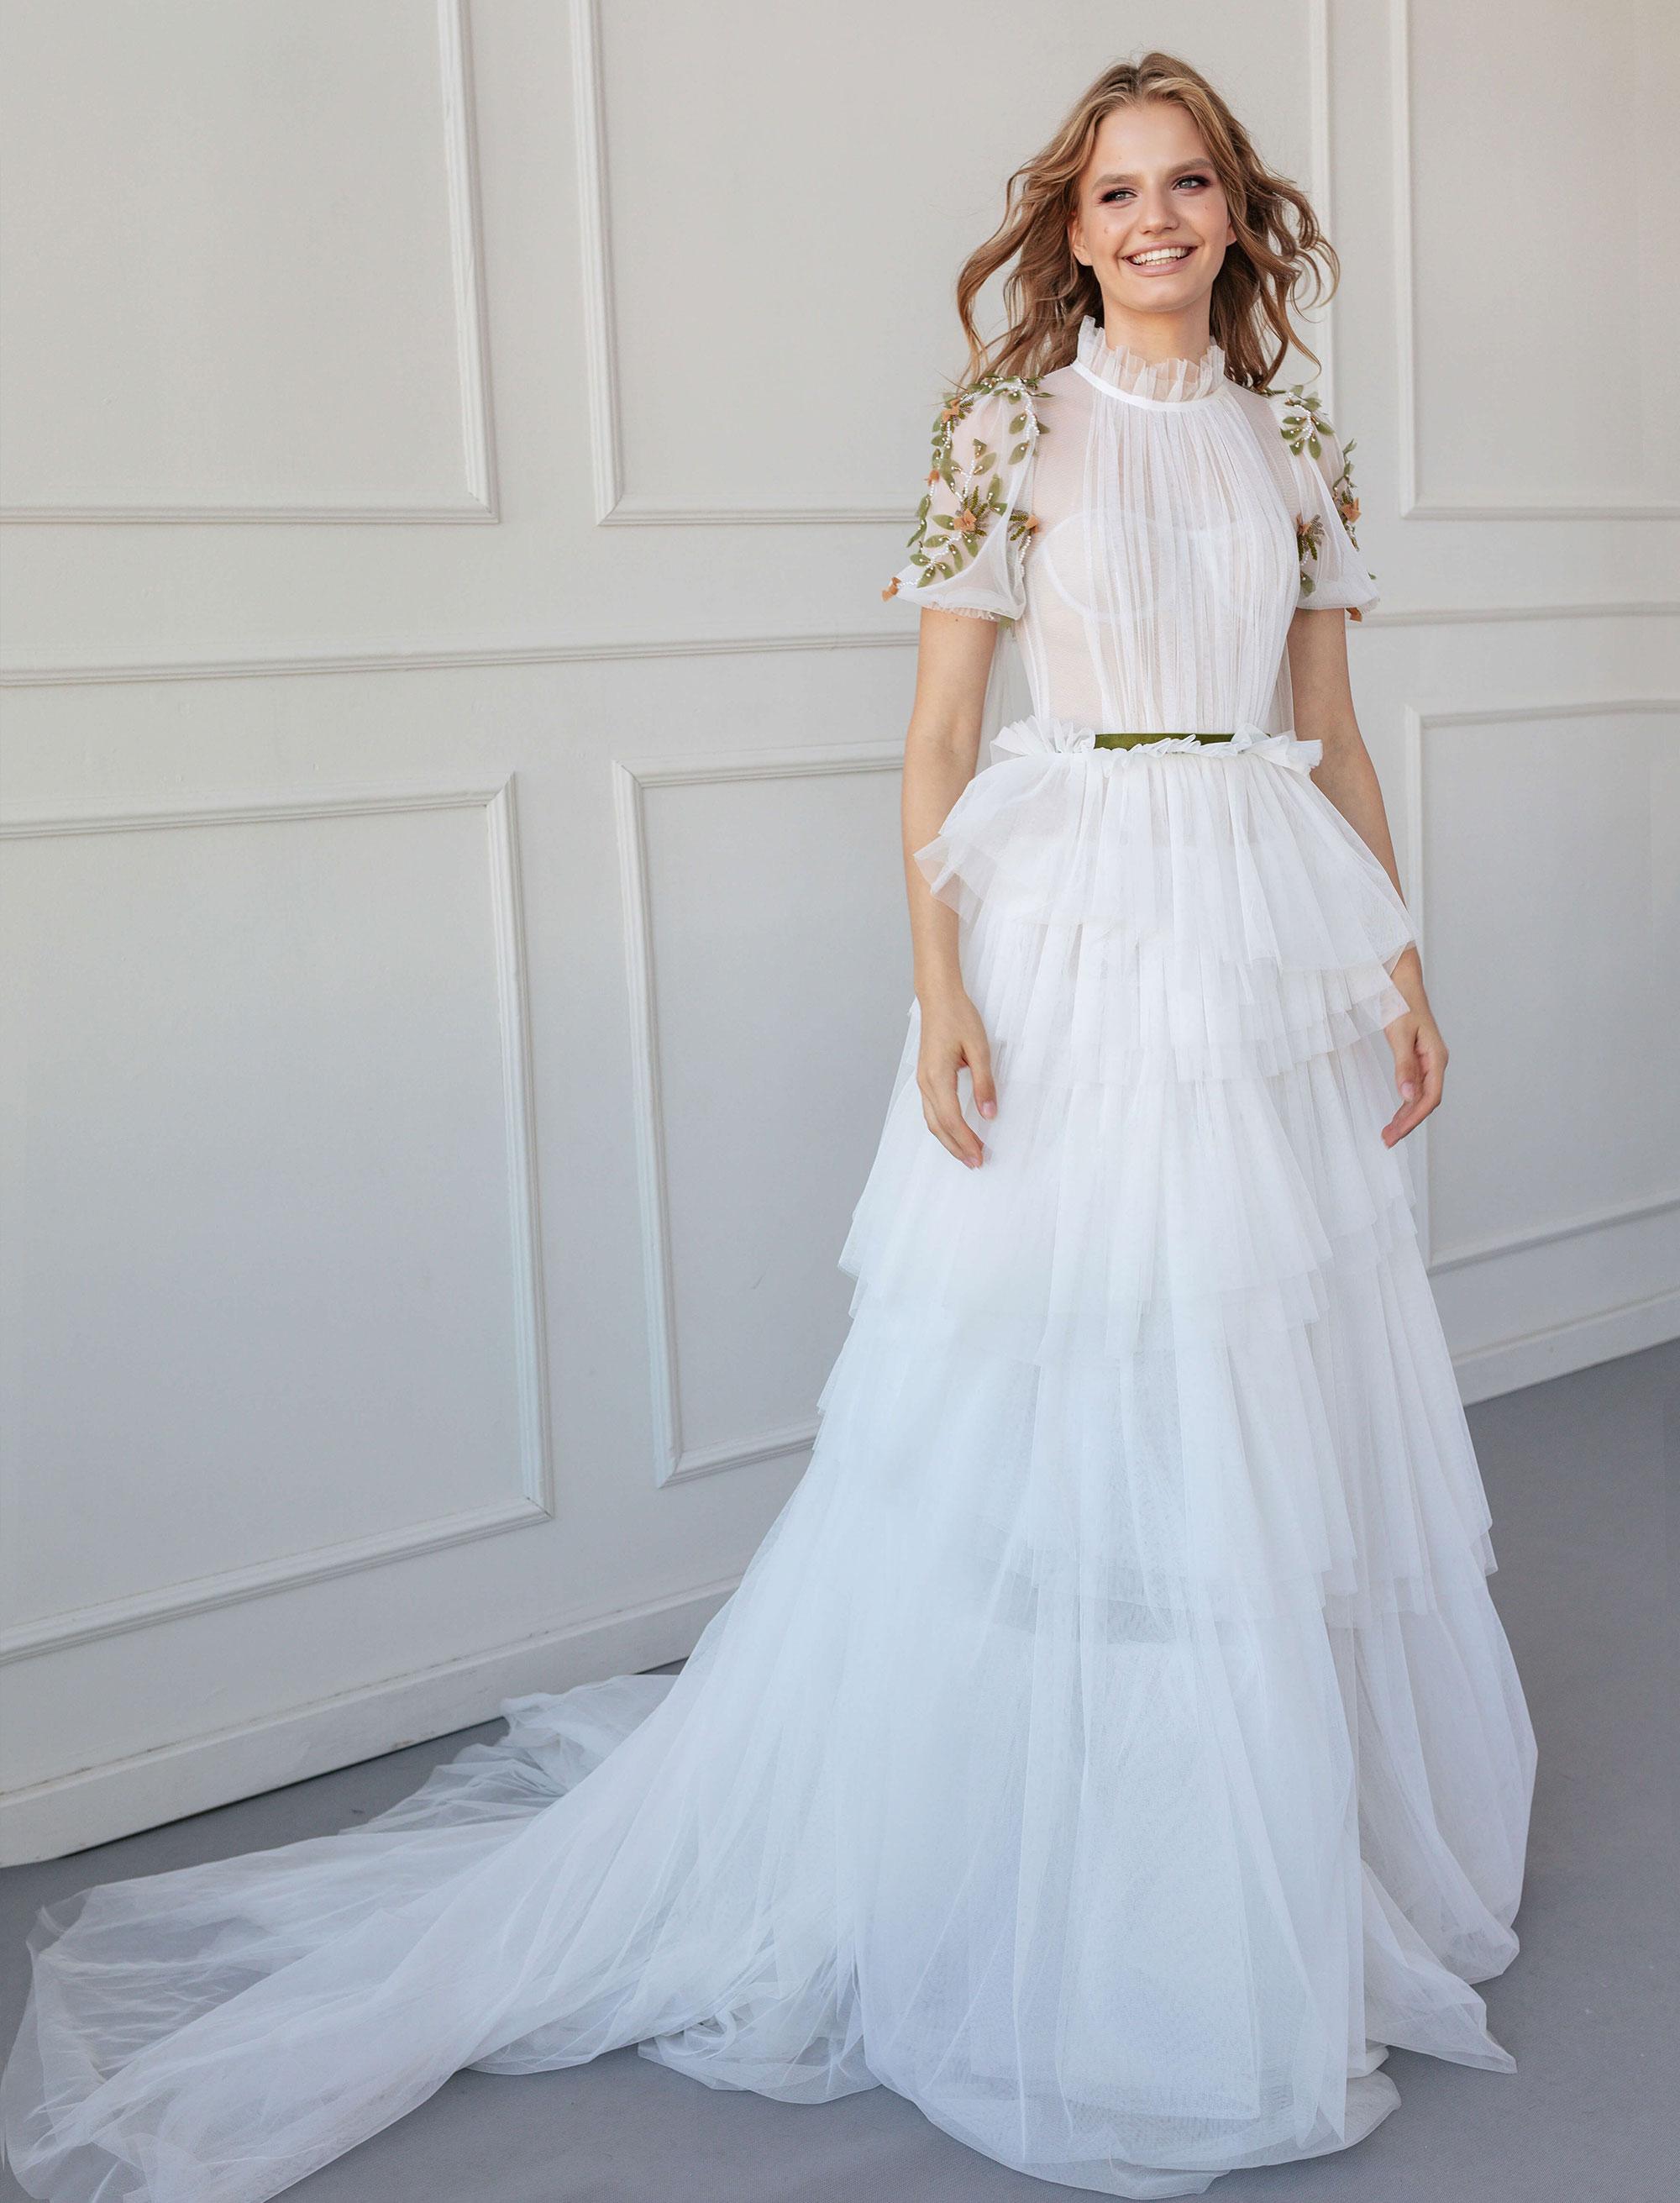 raraavis-gven-santasalonas-vestuvine-suknele